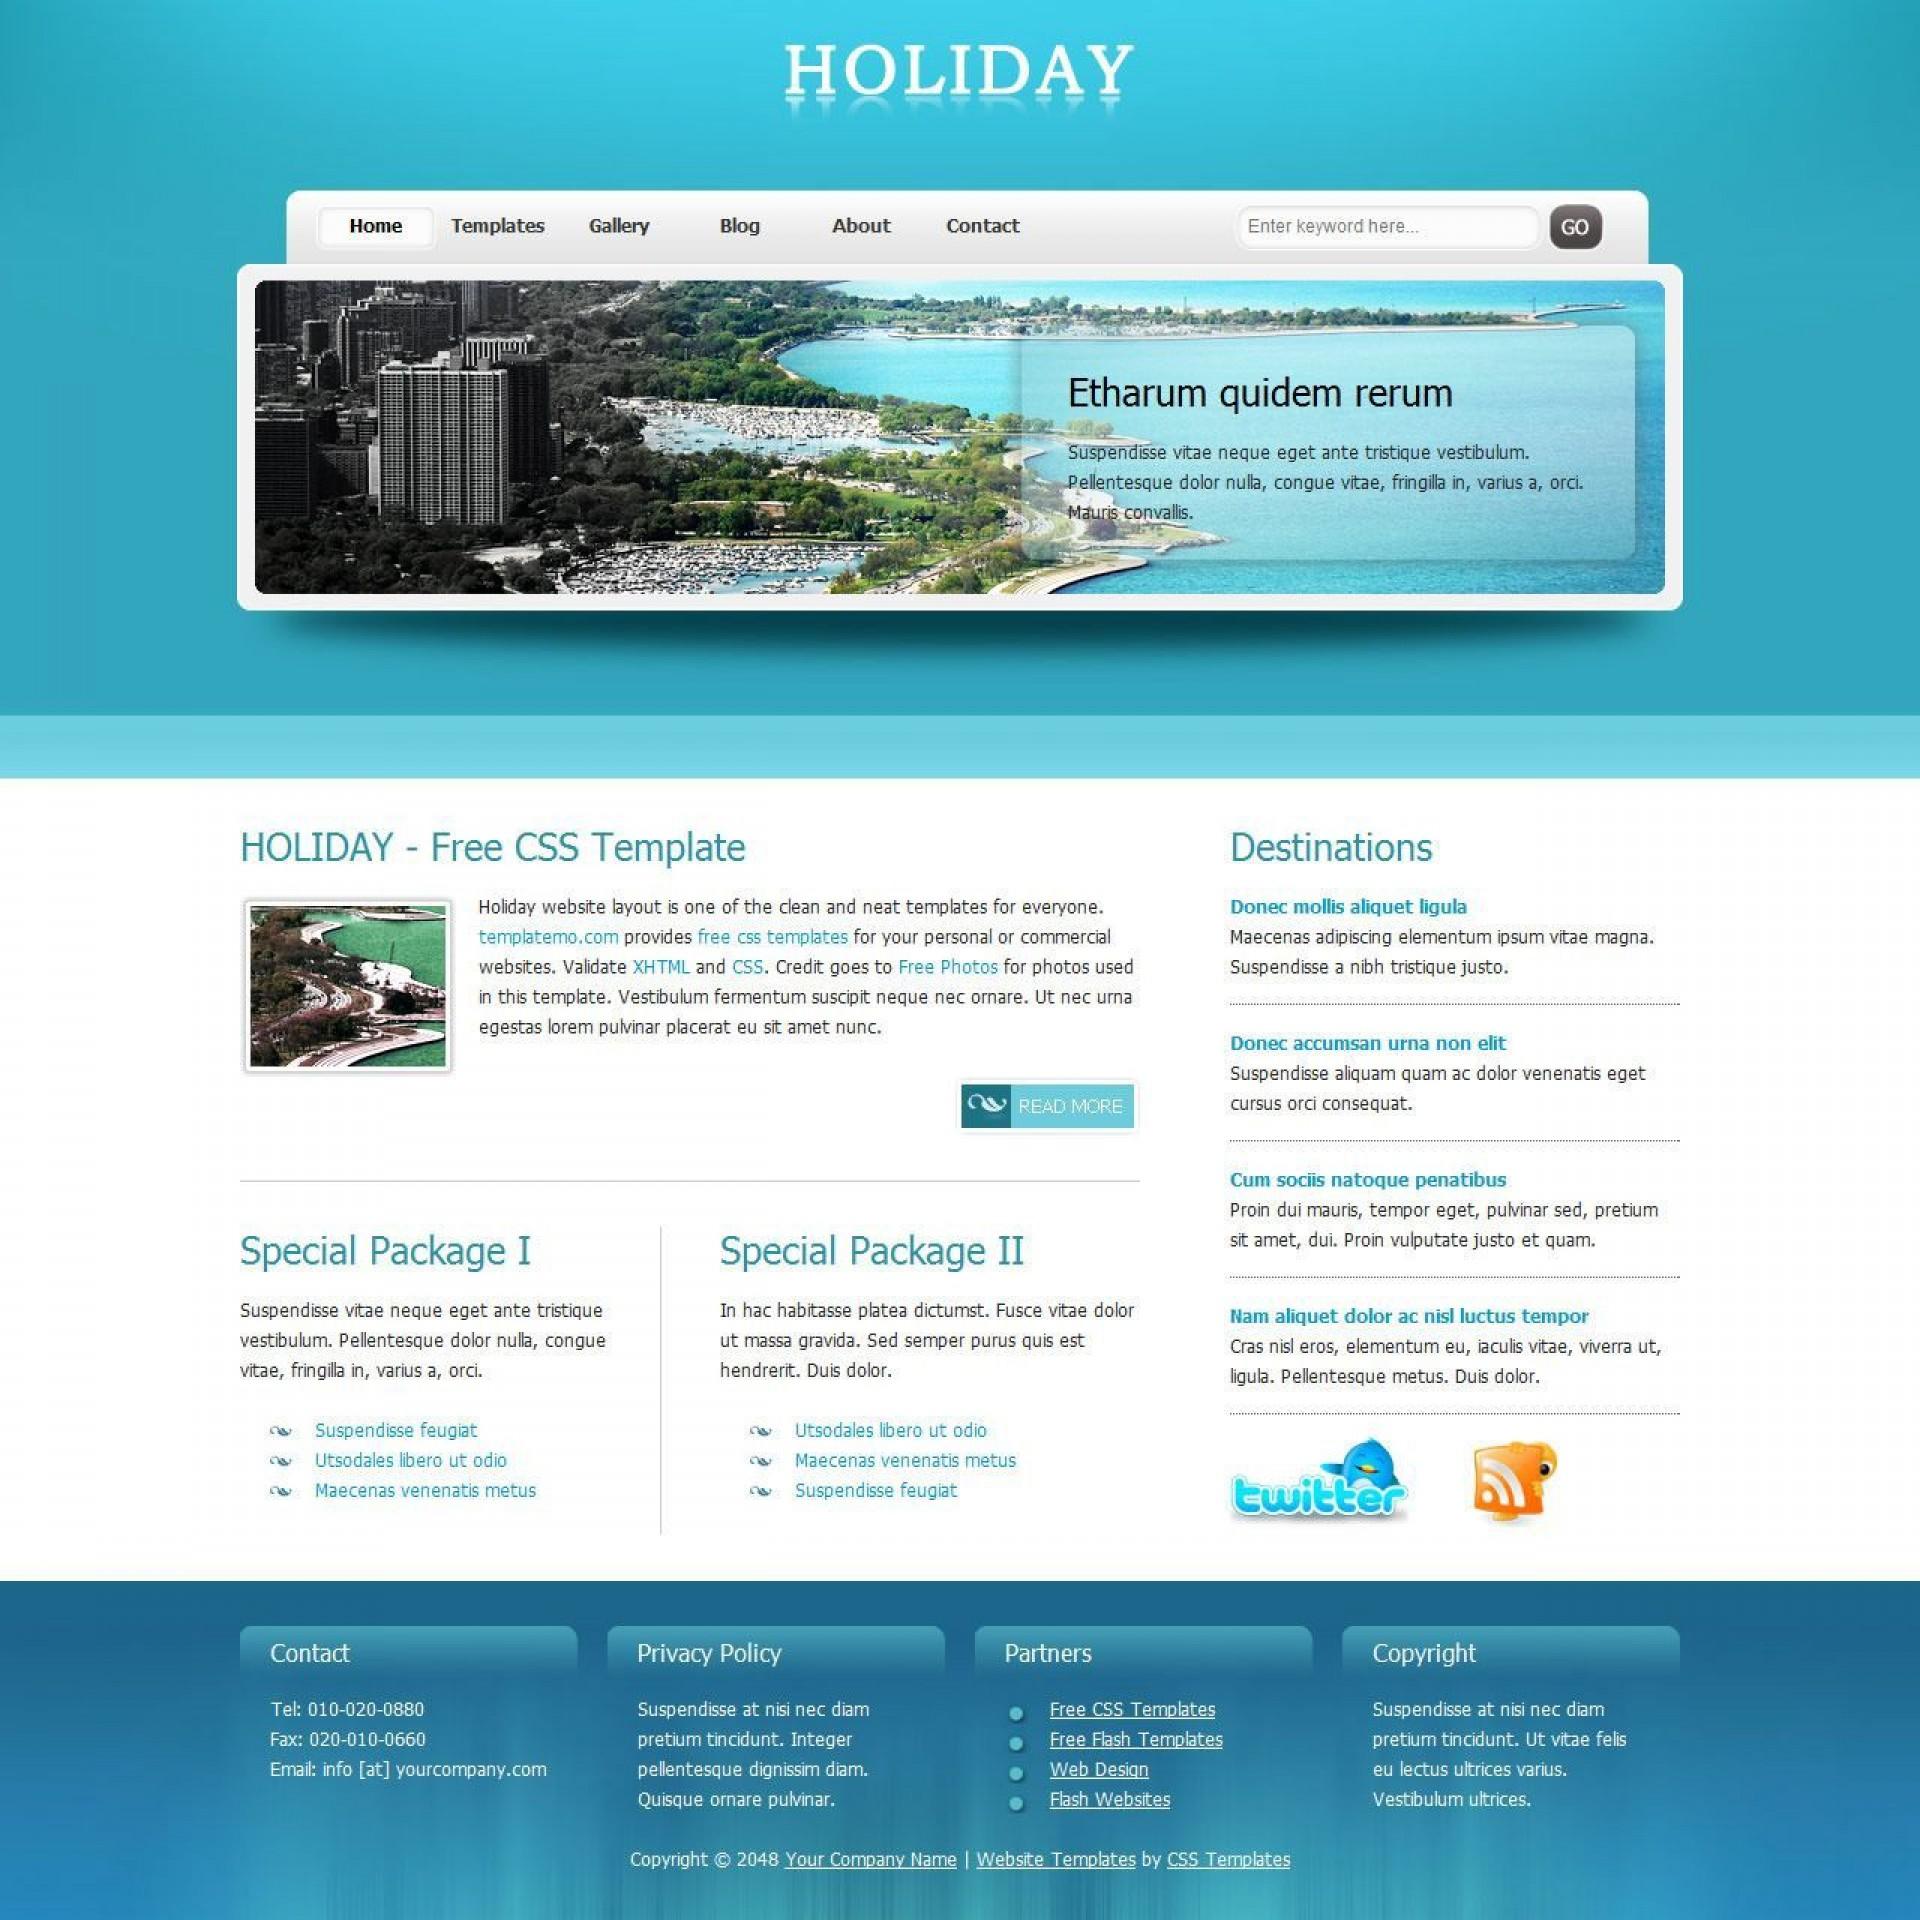 000 Formidable Web Page Design Template Cs Concept  Css1920